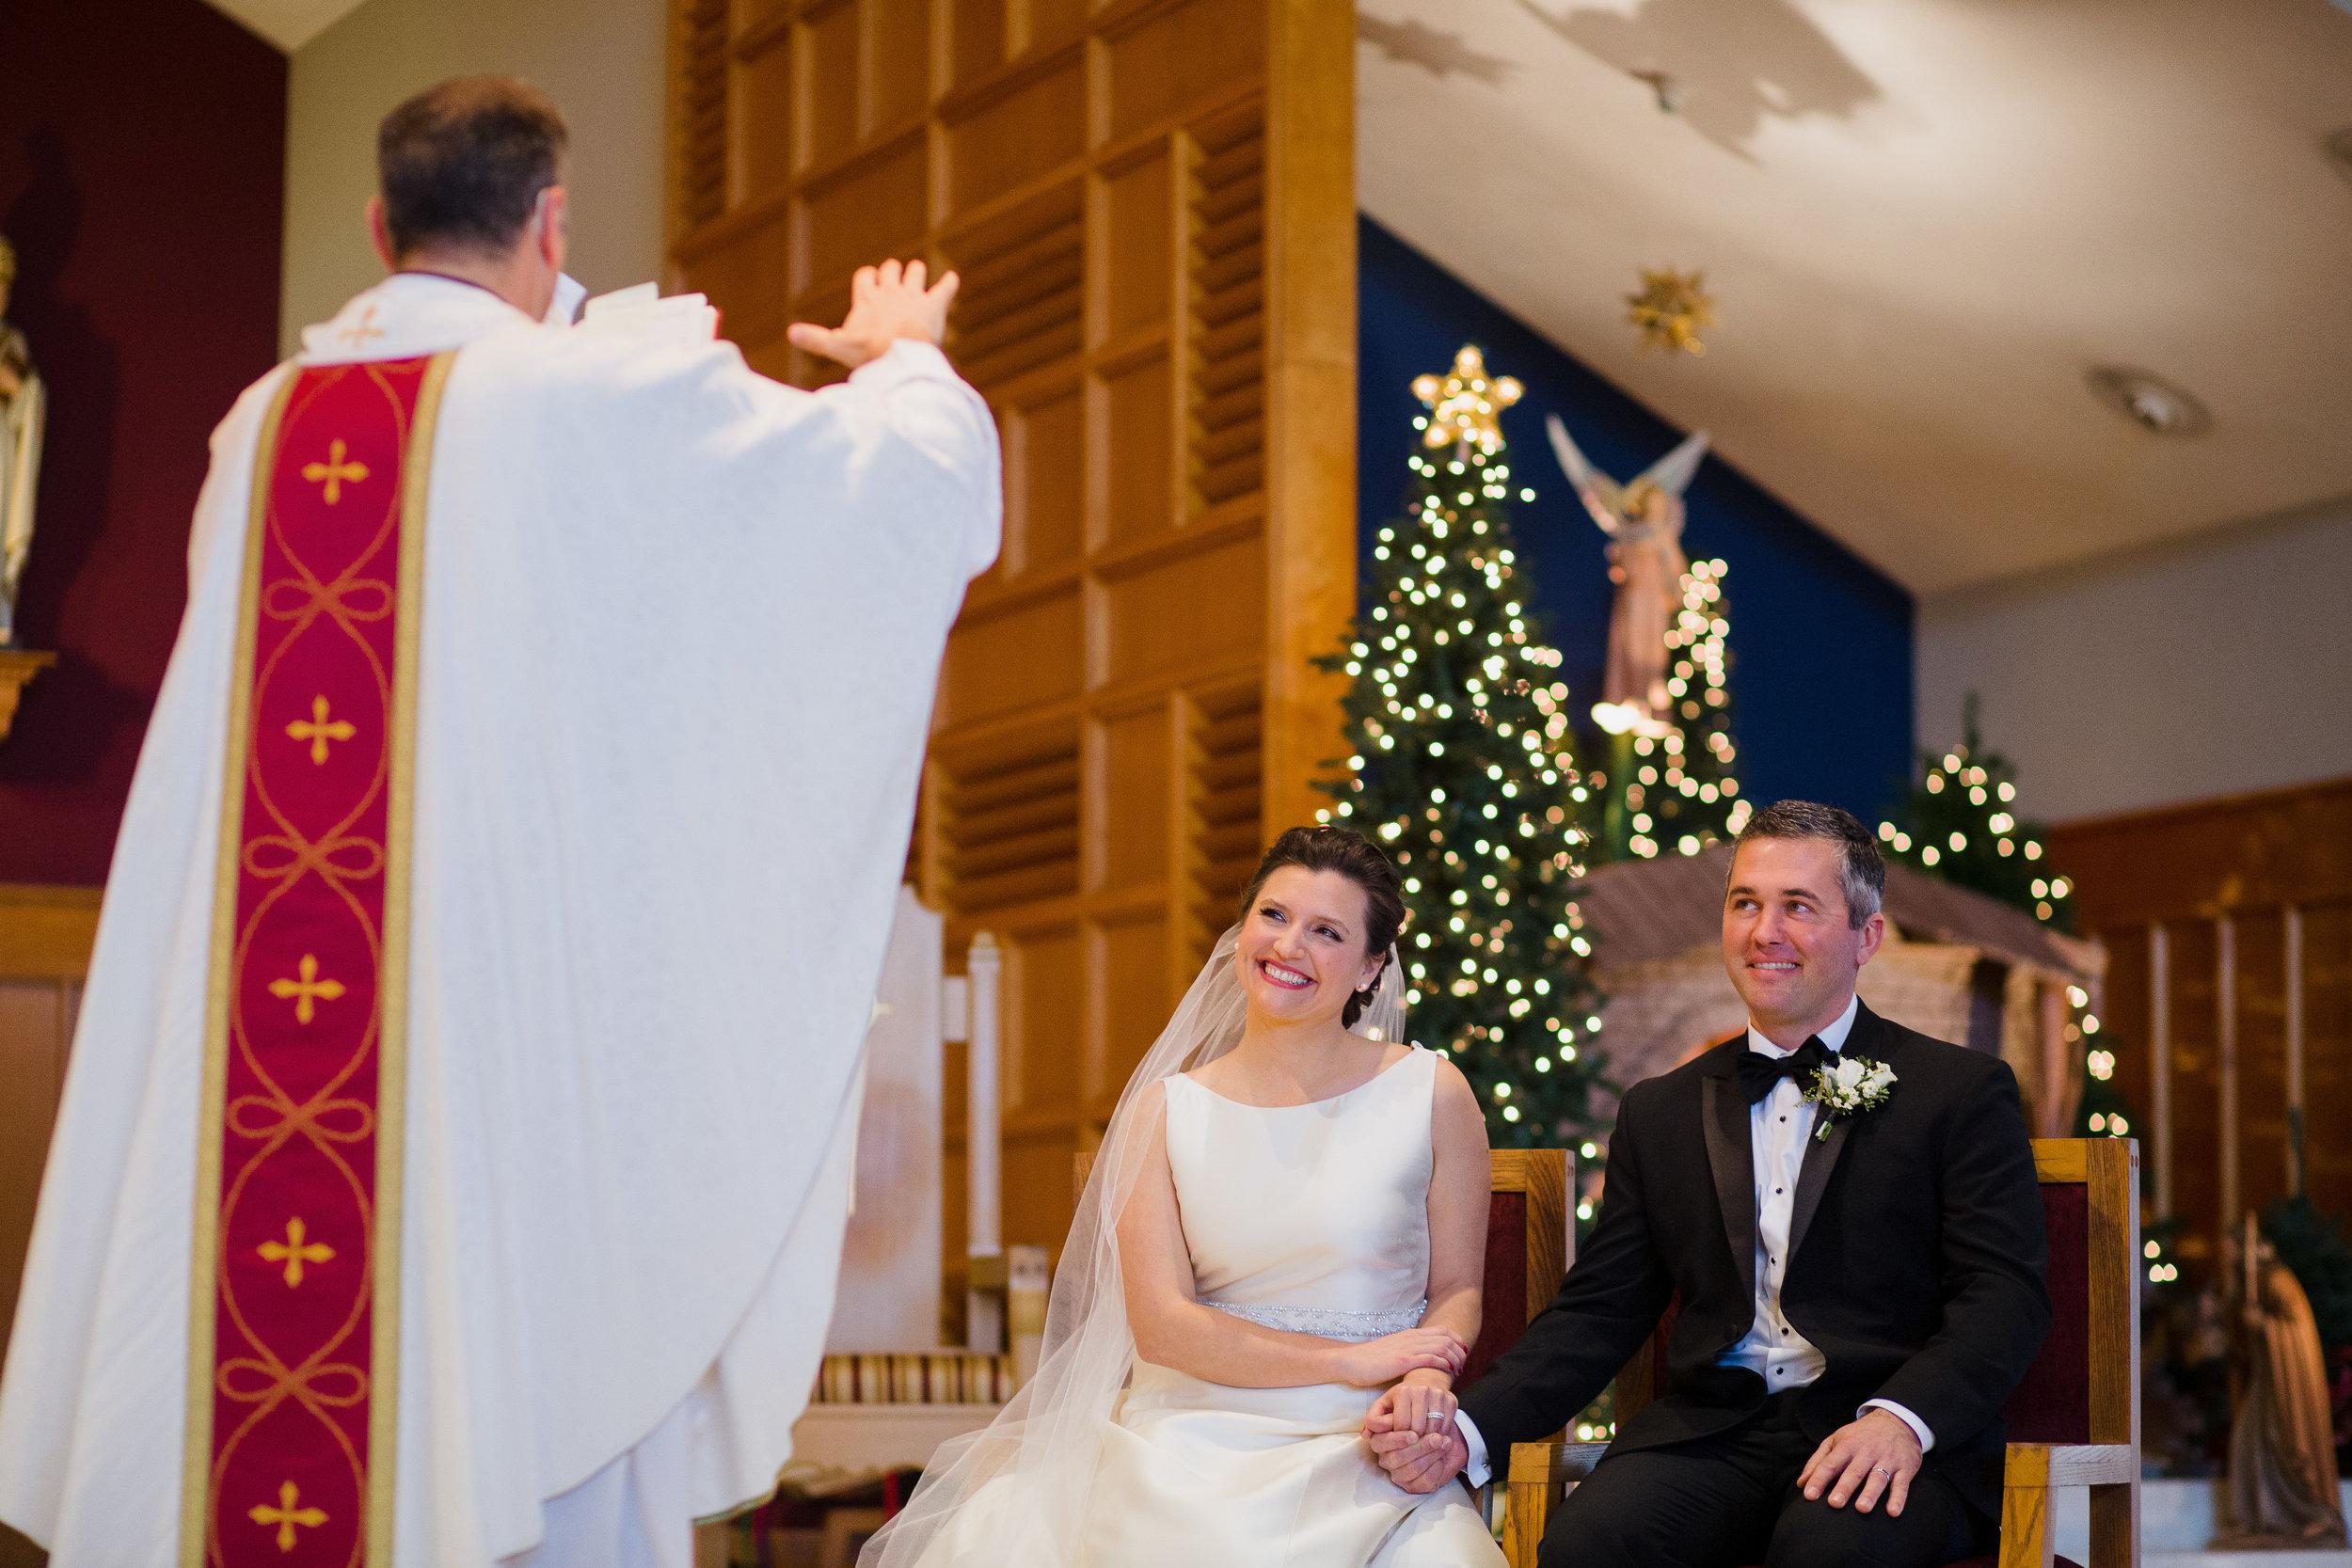 gracies-providence-wedding-092.JPG